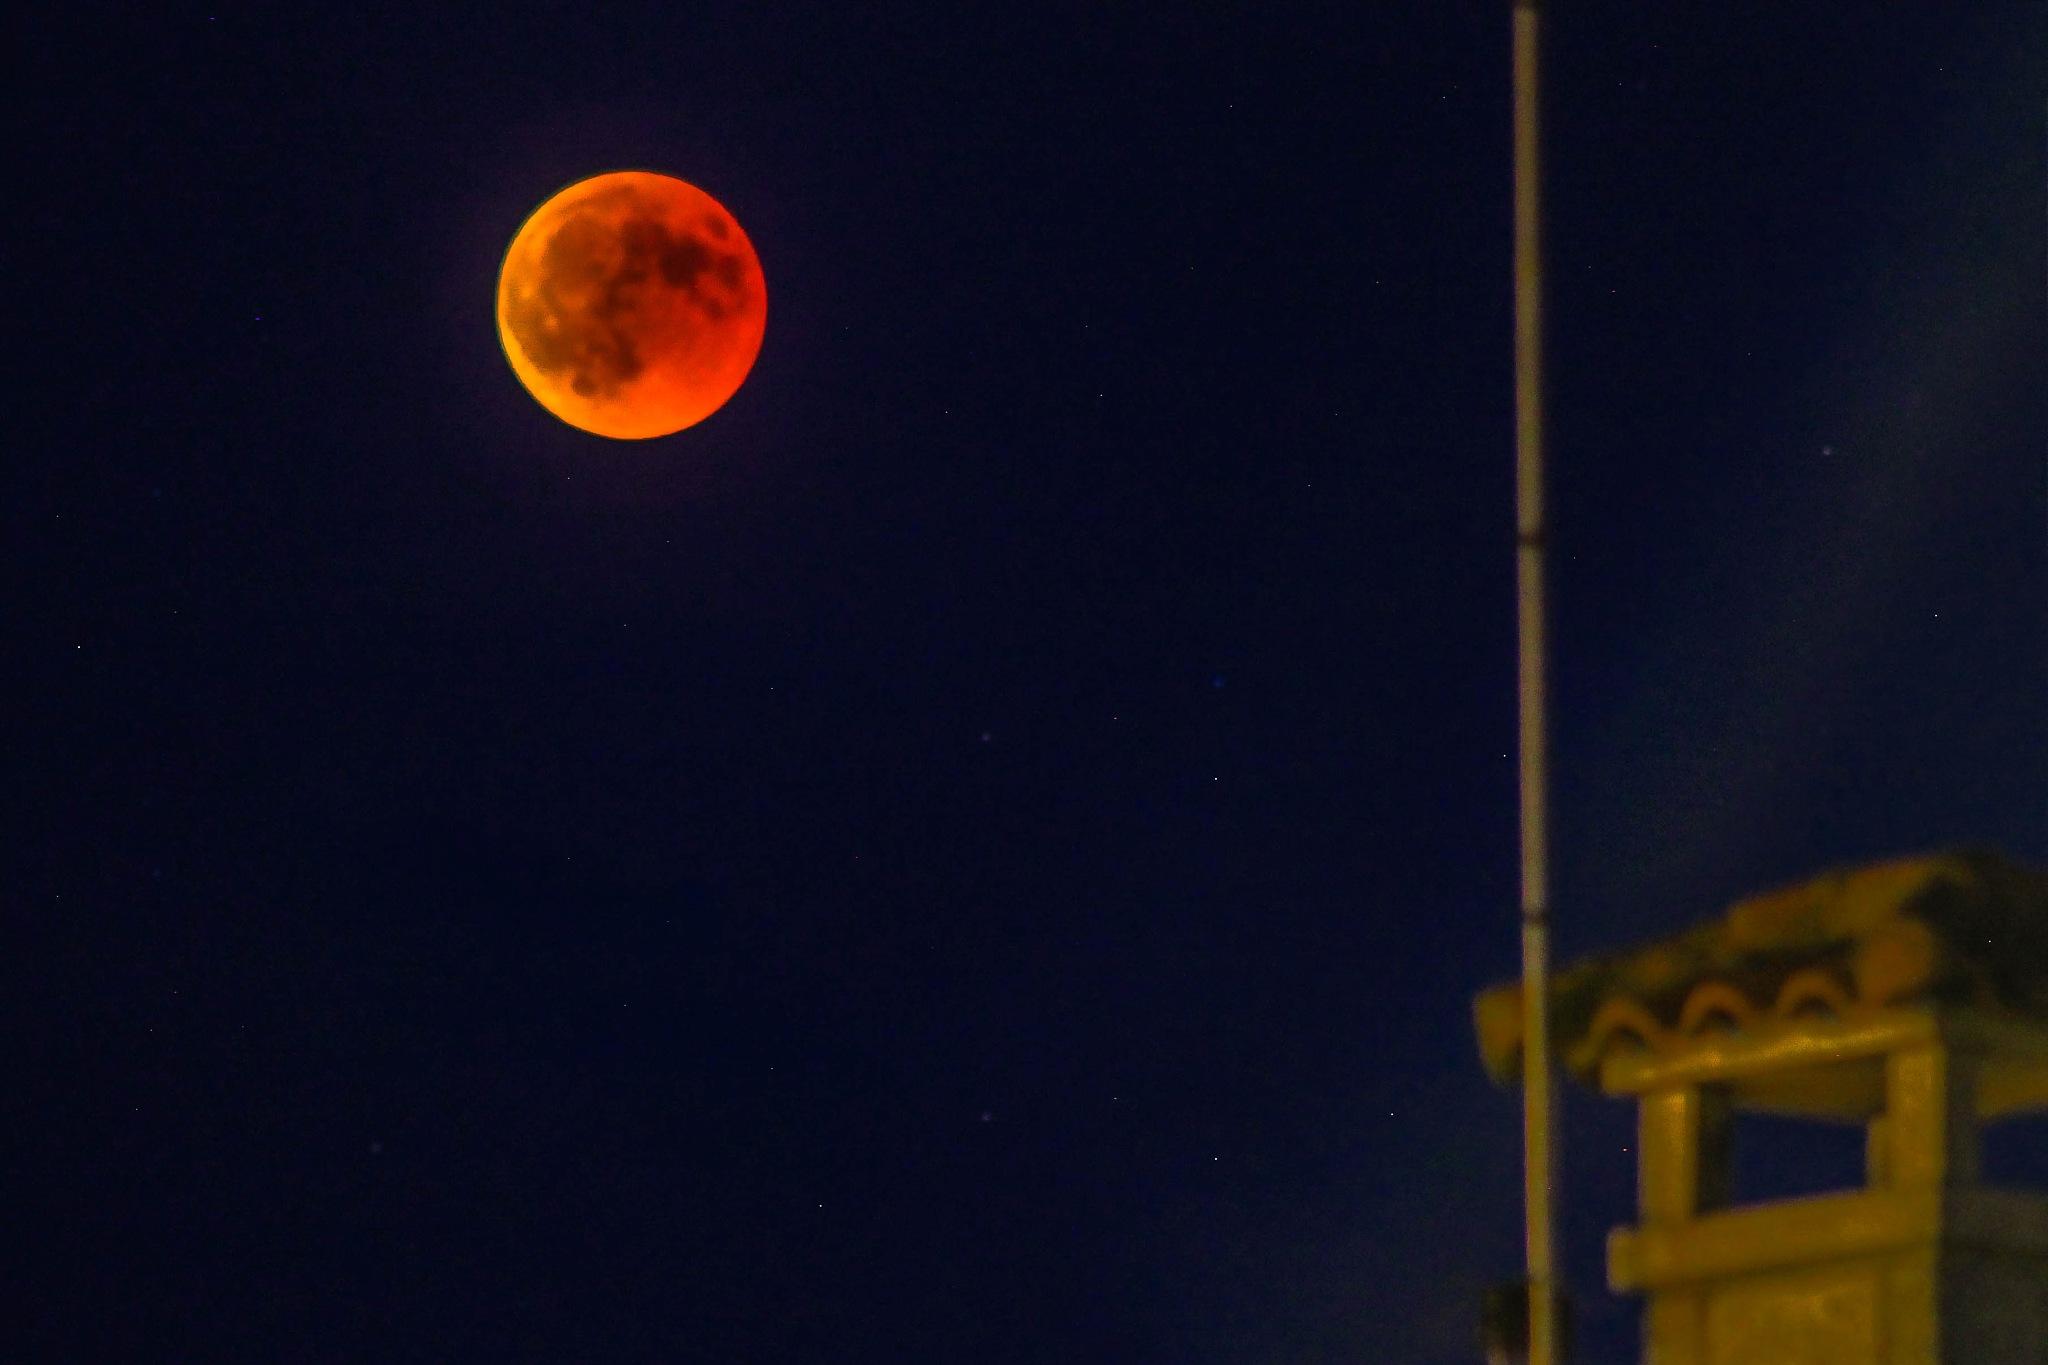 Blood Moon by Lamartine Dias